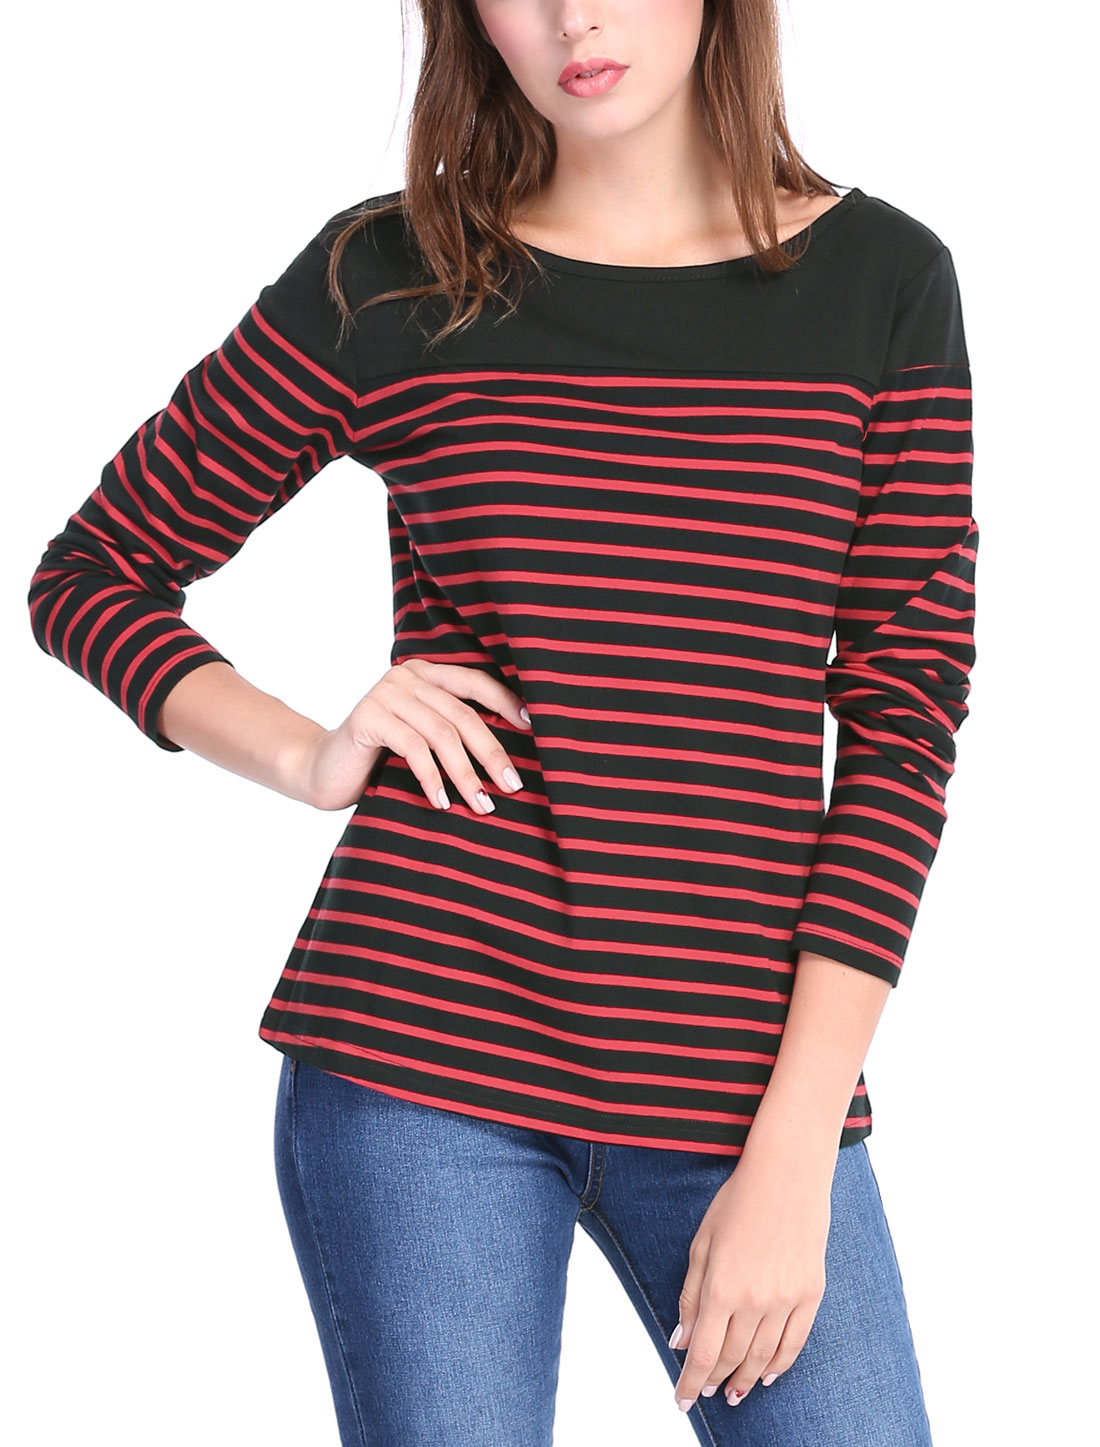 Allegra K Women Classic Striped Long Sleeves Stretch T-Shirt Black Red M